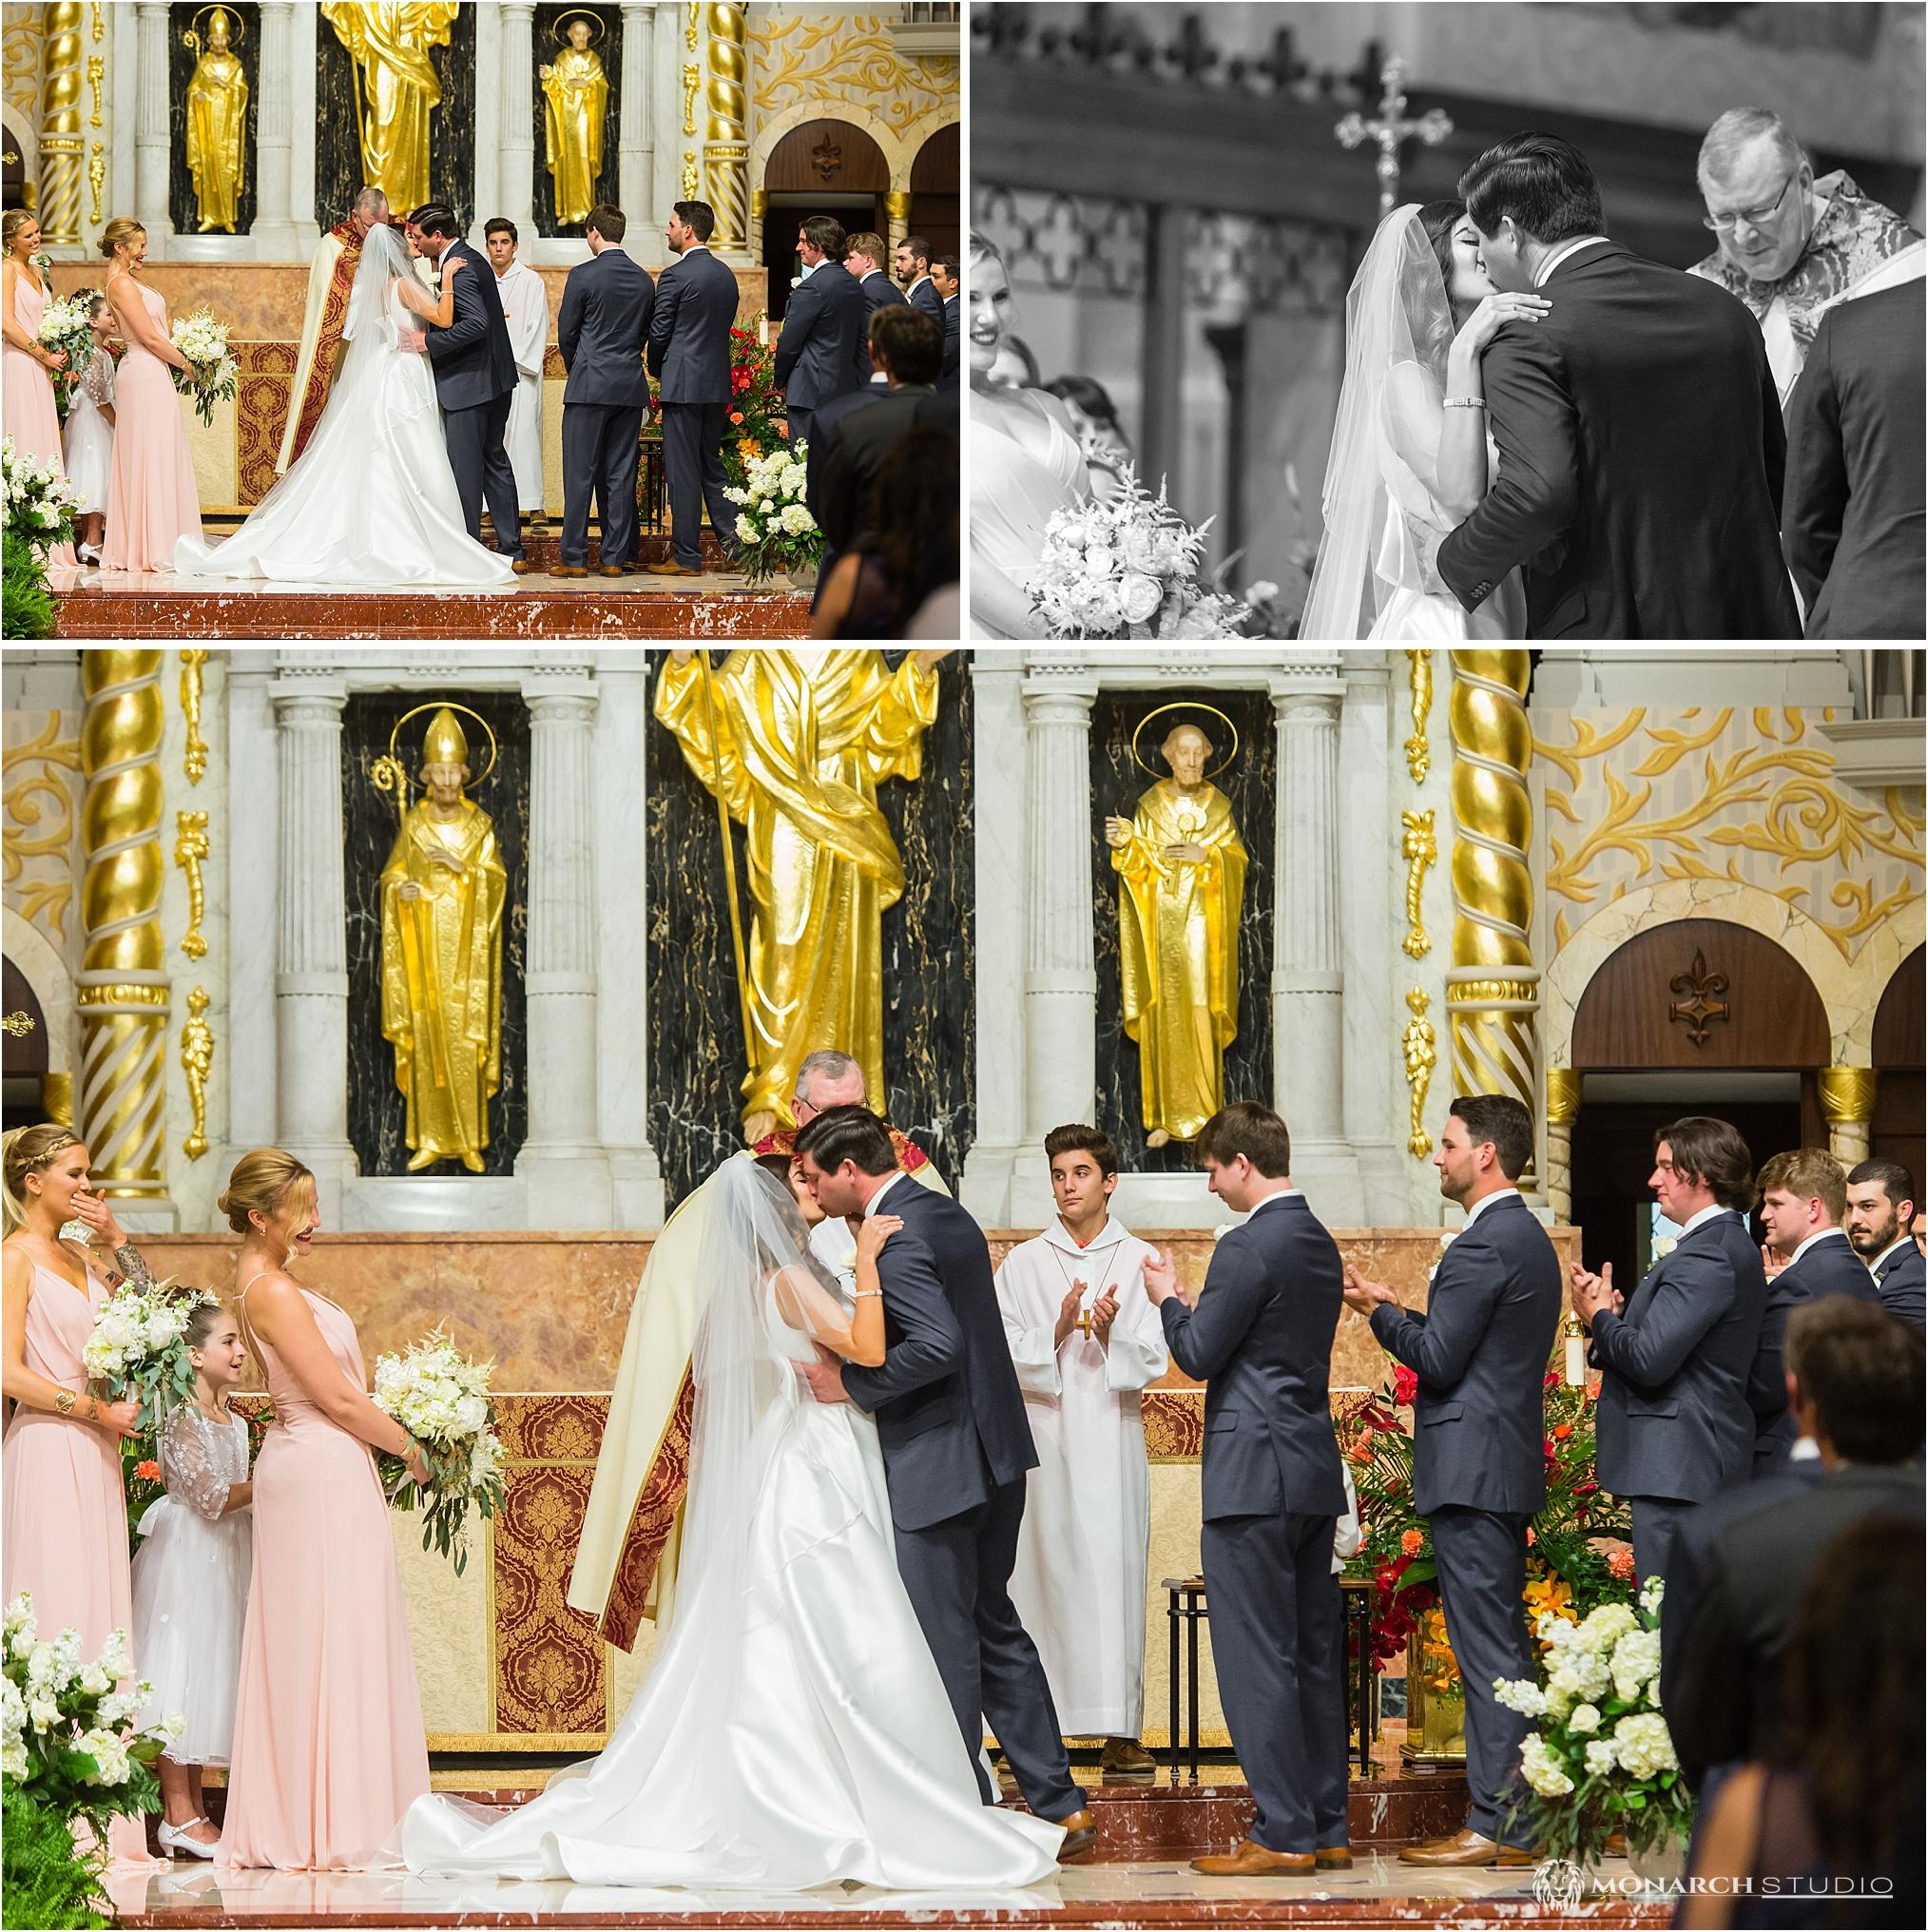 st-augustine-wedding-photographer-072.jpg